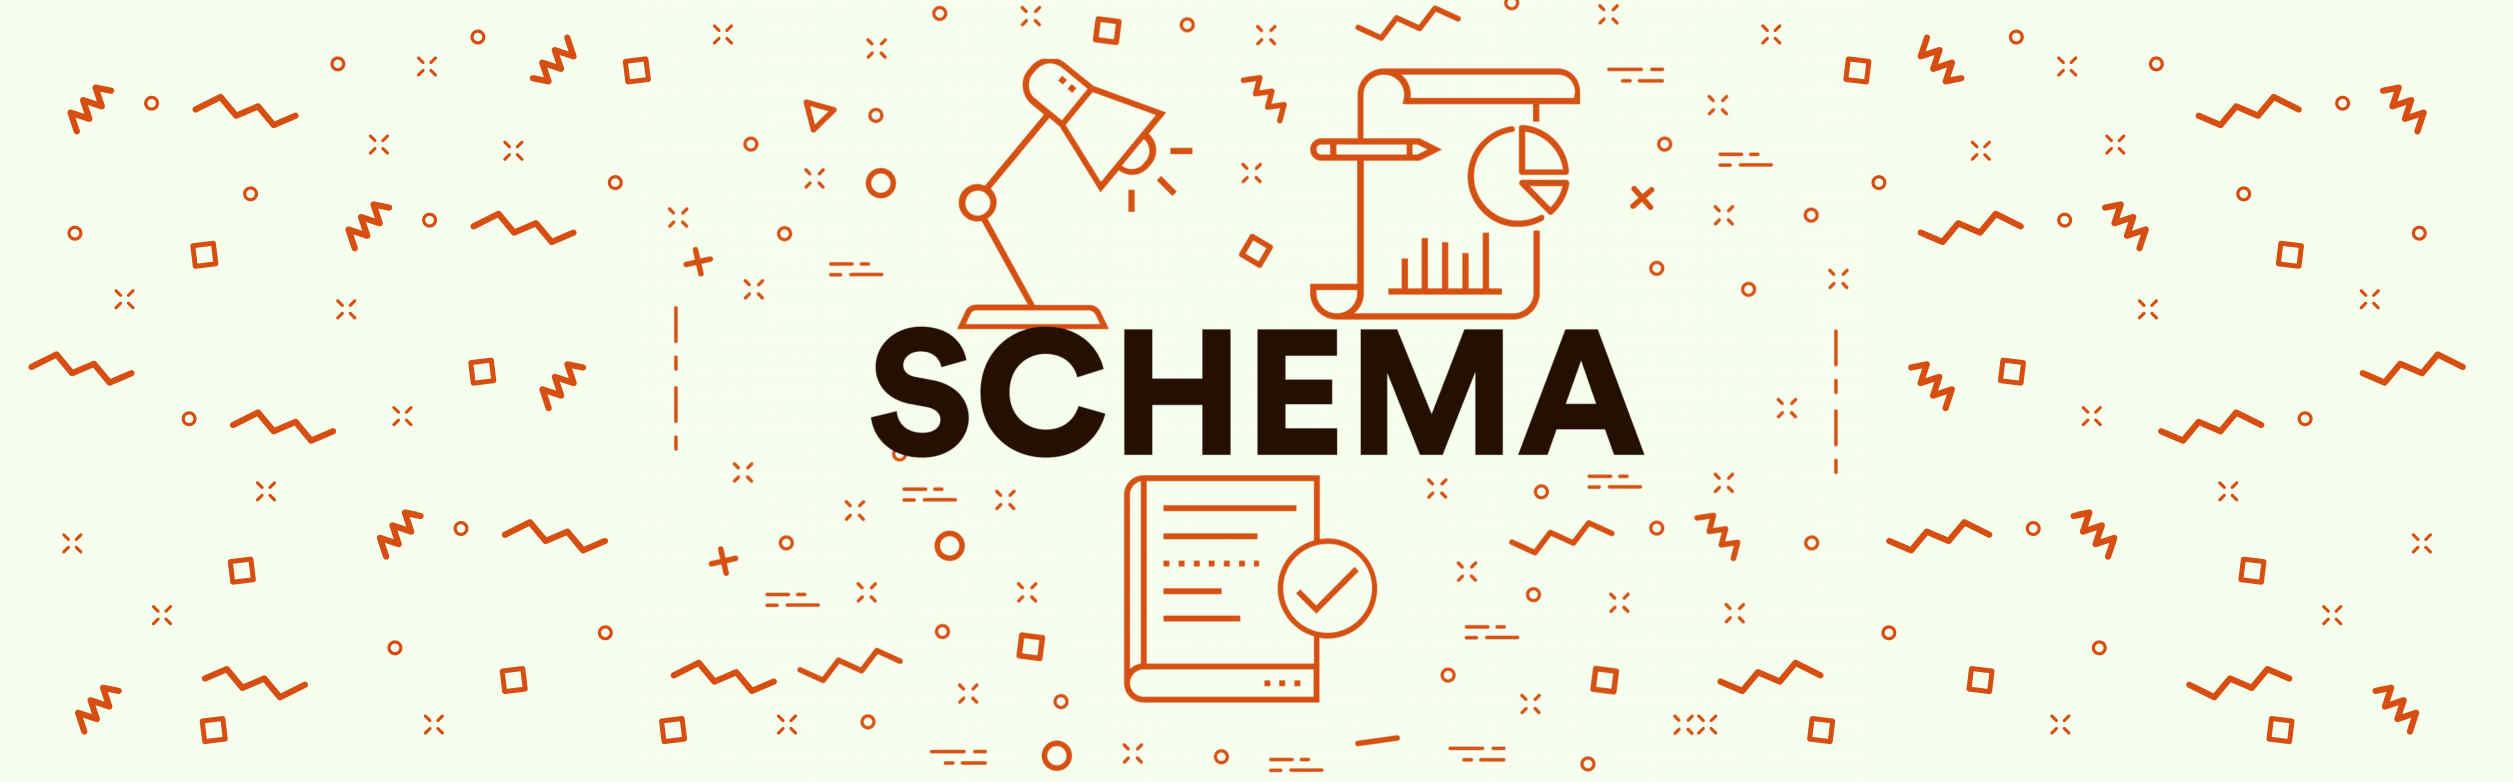 schema-type-to-use